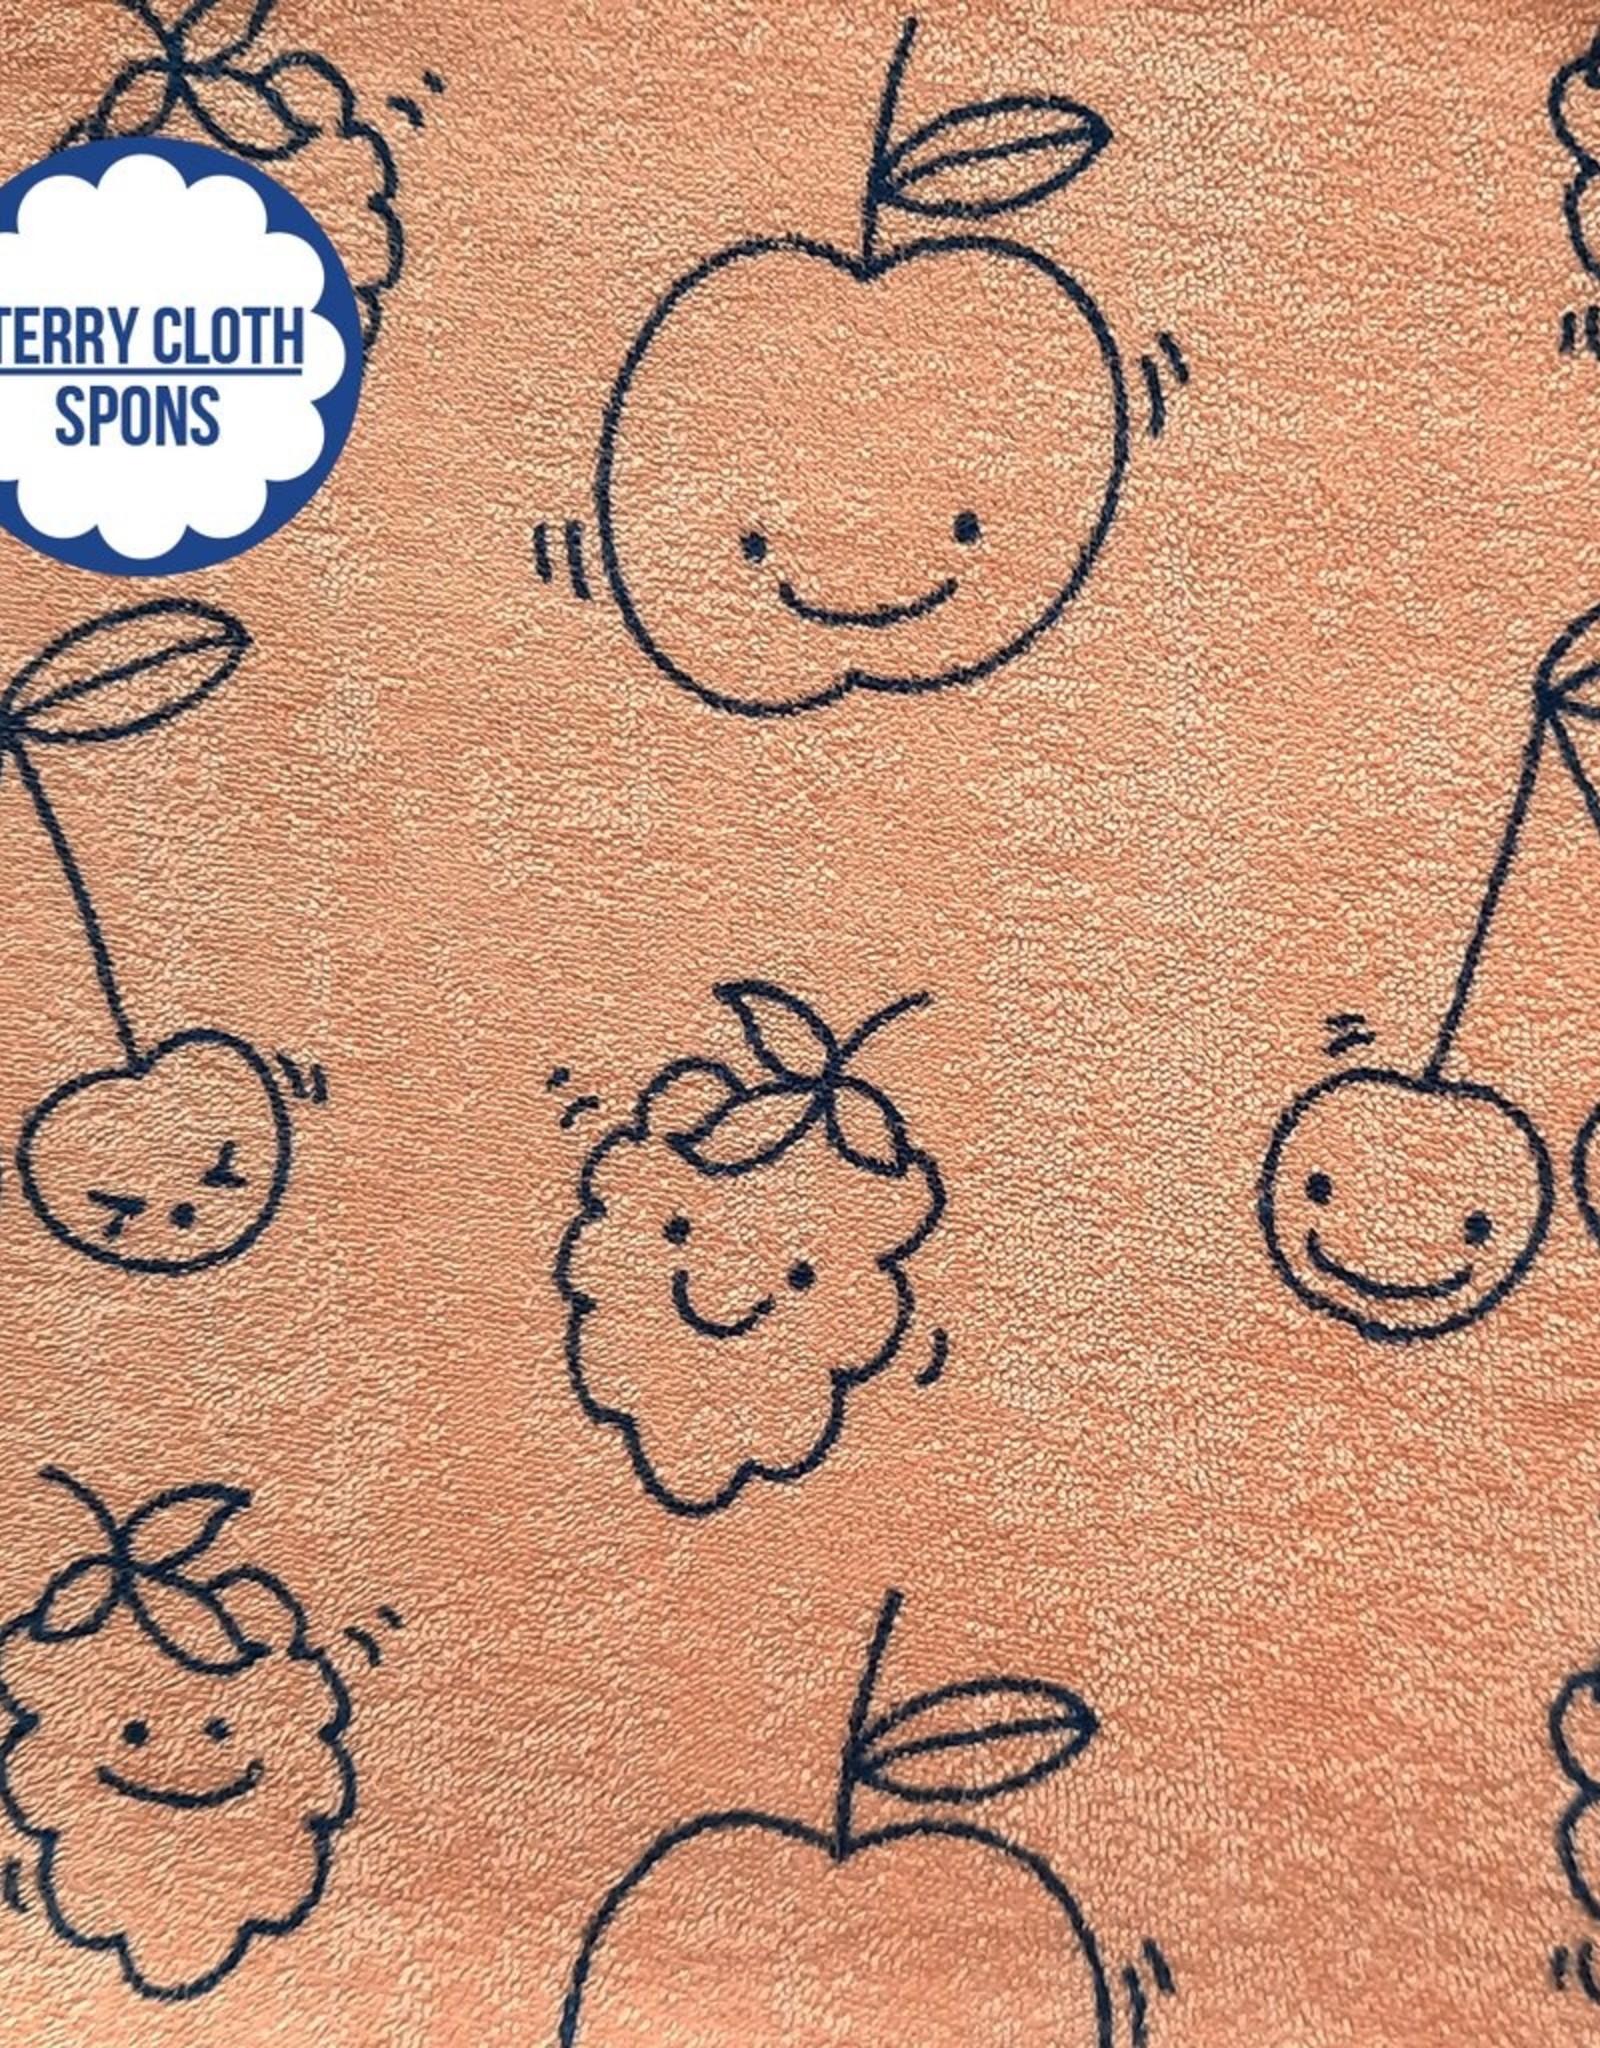 About Blue Fabrics Sea You - HAPPY FRUIT (Sponge/Terry Cloth)